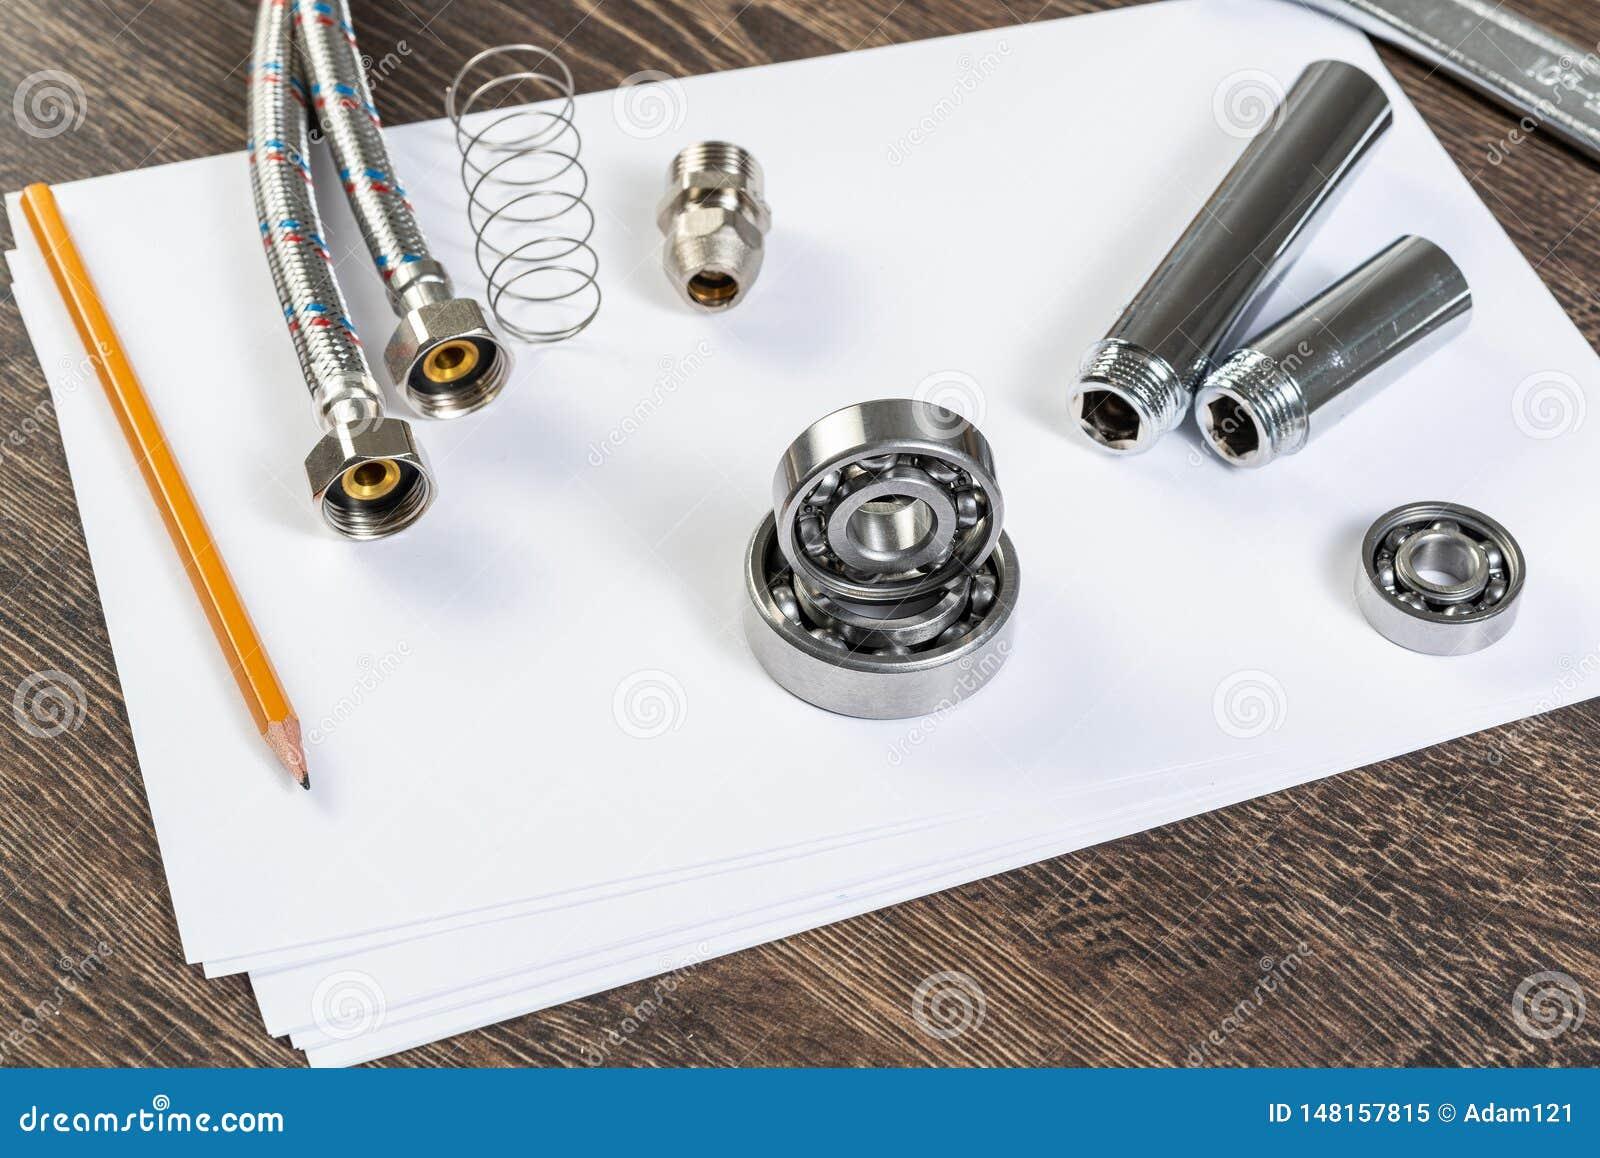 Plumbing pipeline and ball bearings